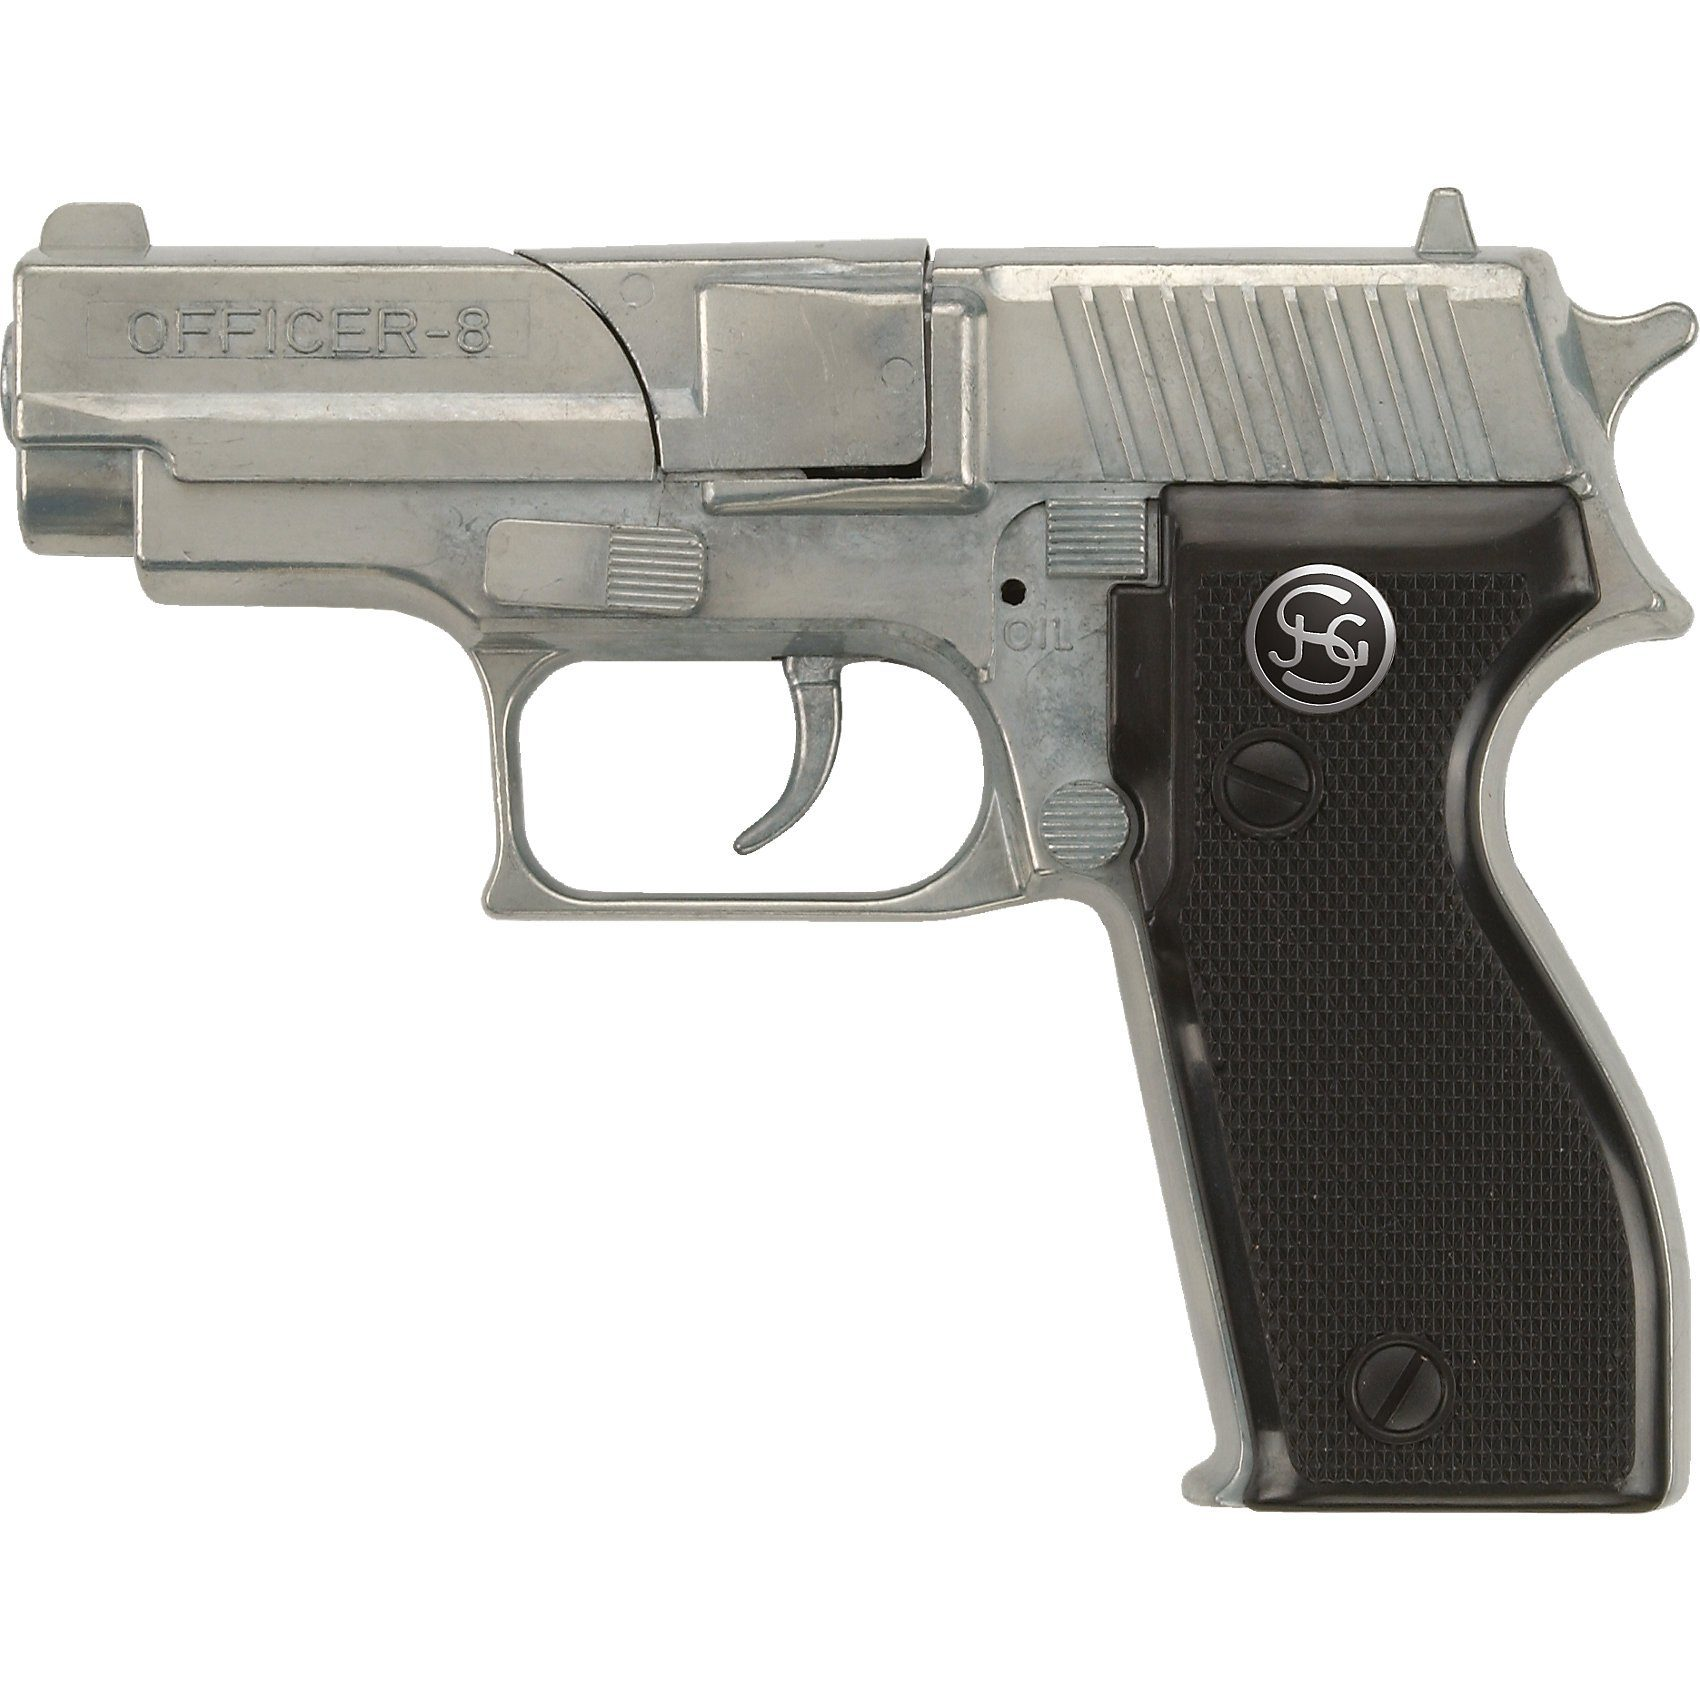 Schrödel Pistole Officer, 8 Schuss